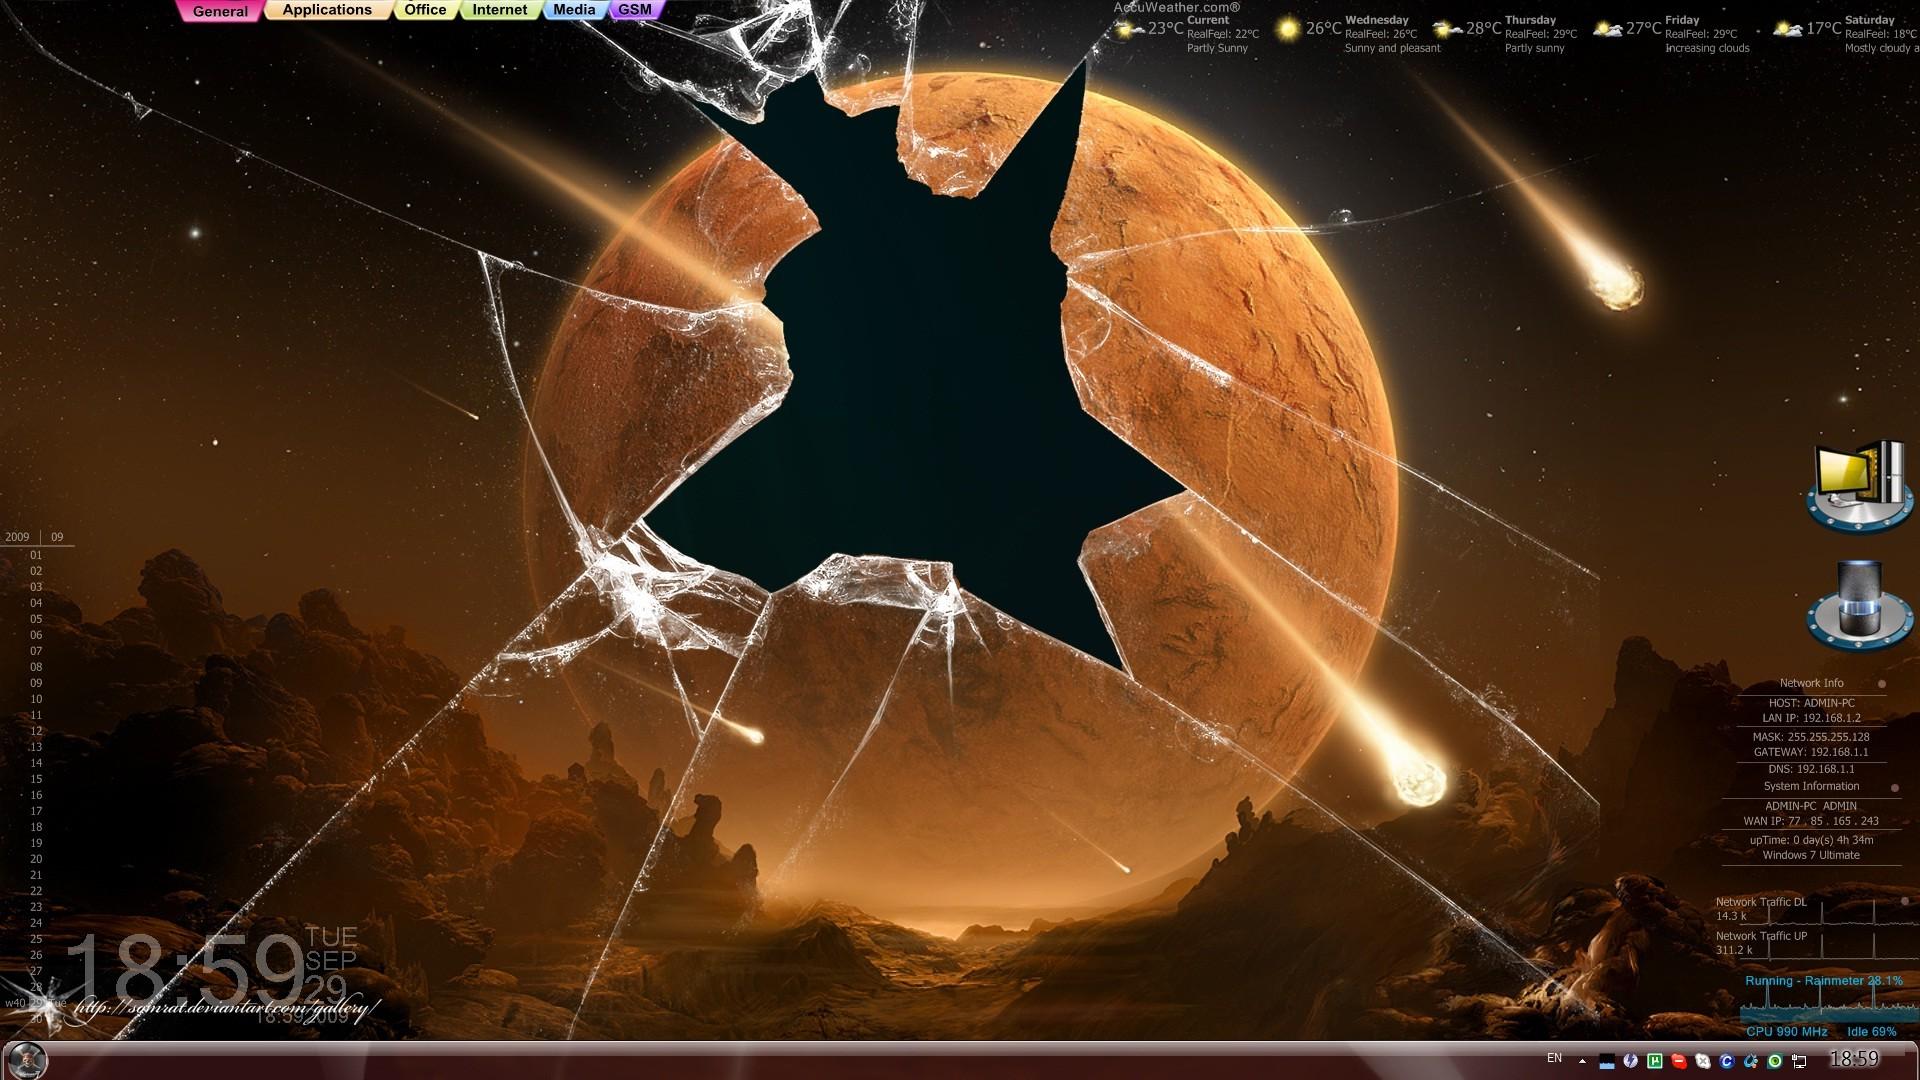 Res: 1920x1080, Planet Broken Screen Wallpaper Photo